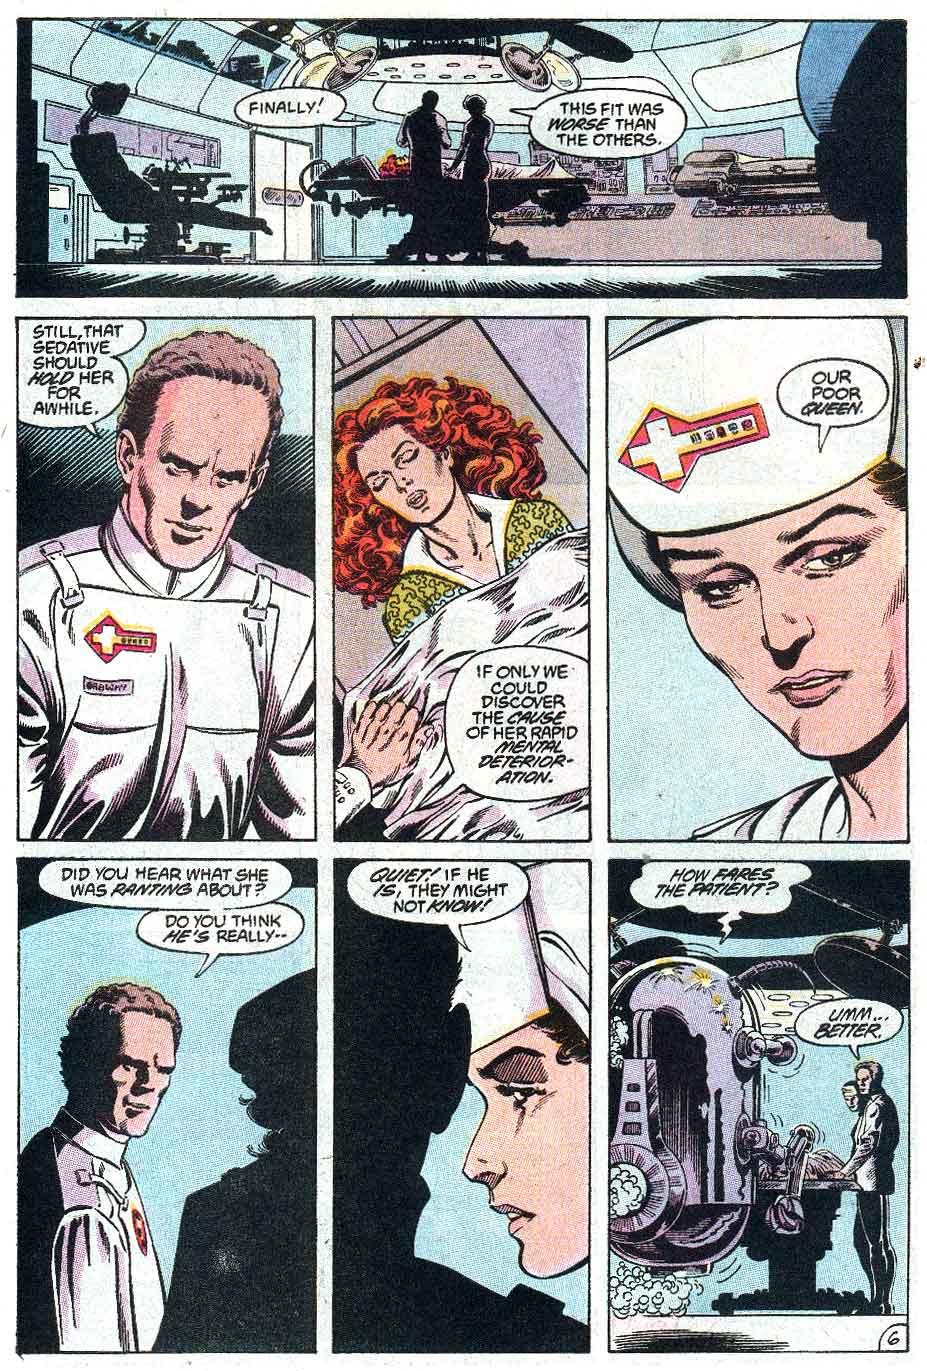 Aquaman (1989) 2 Page 6